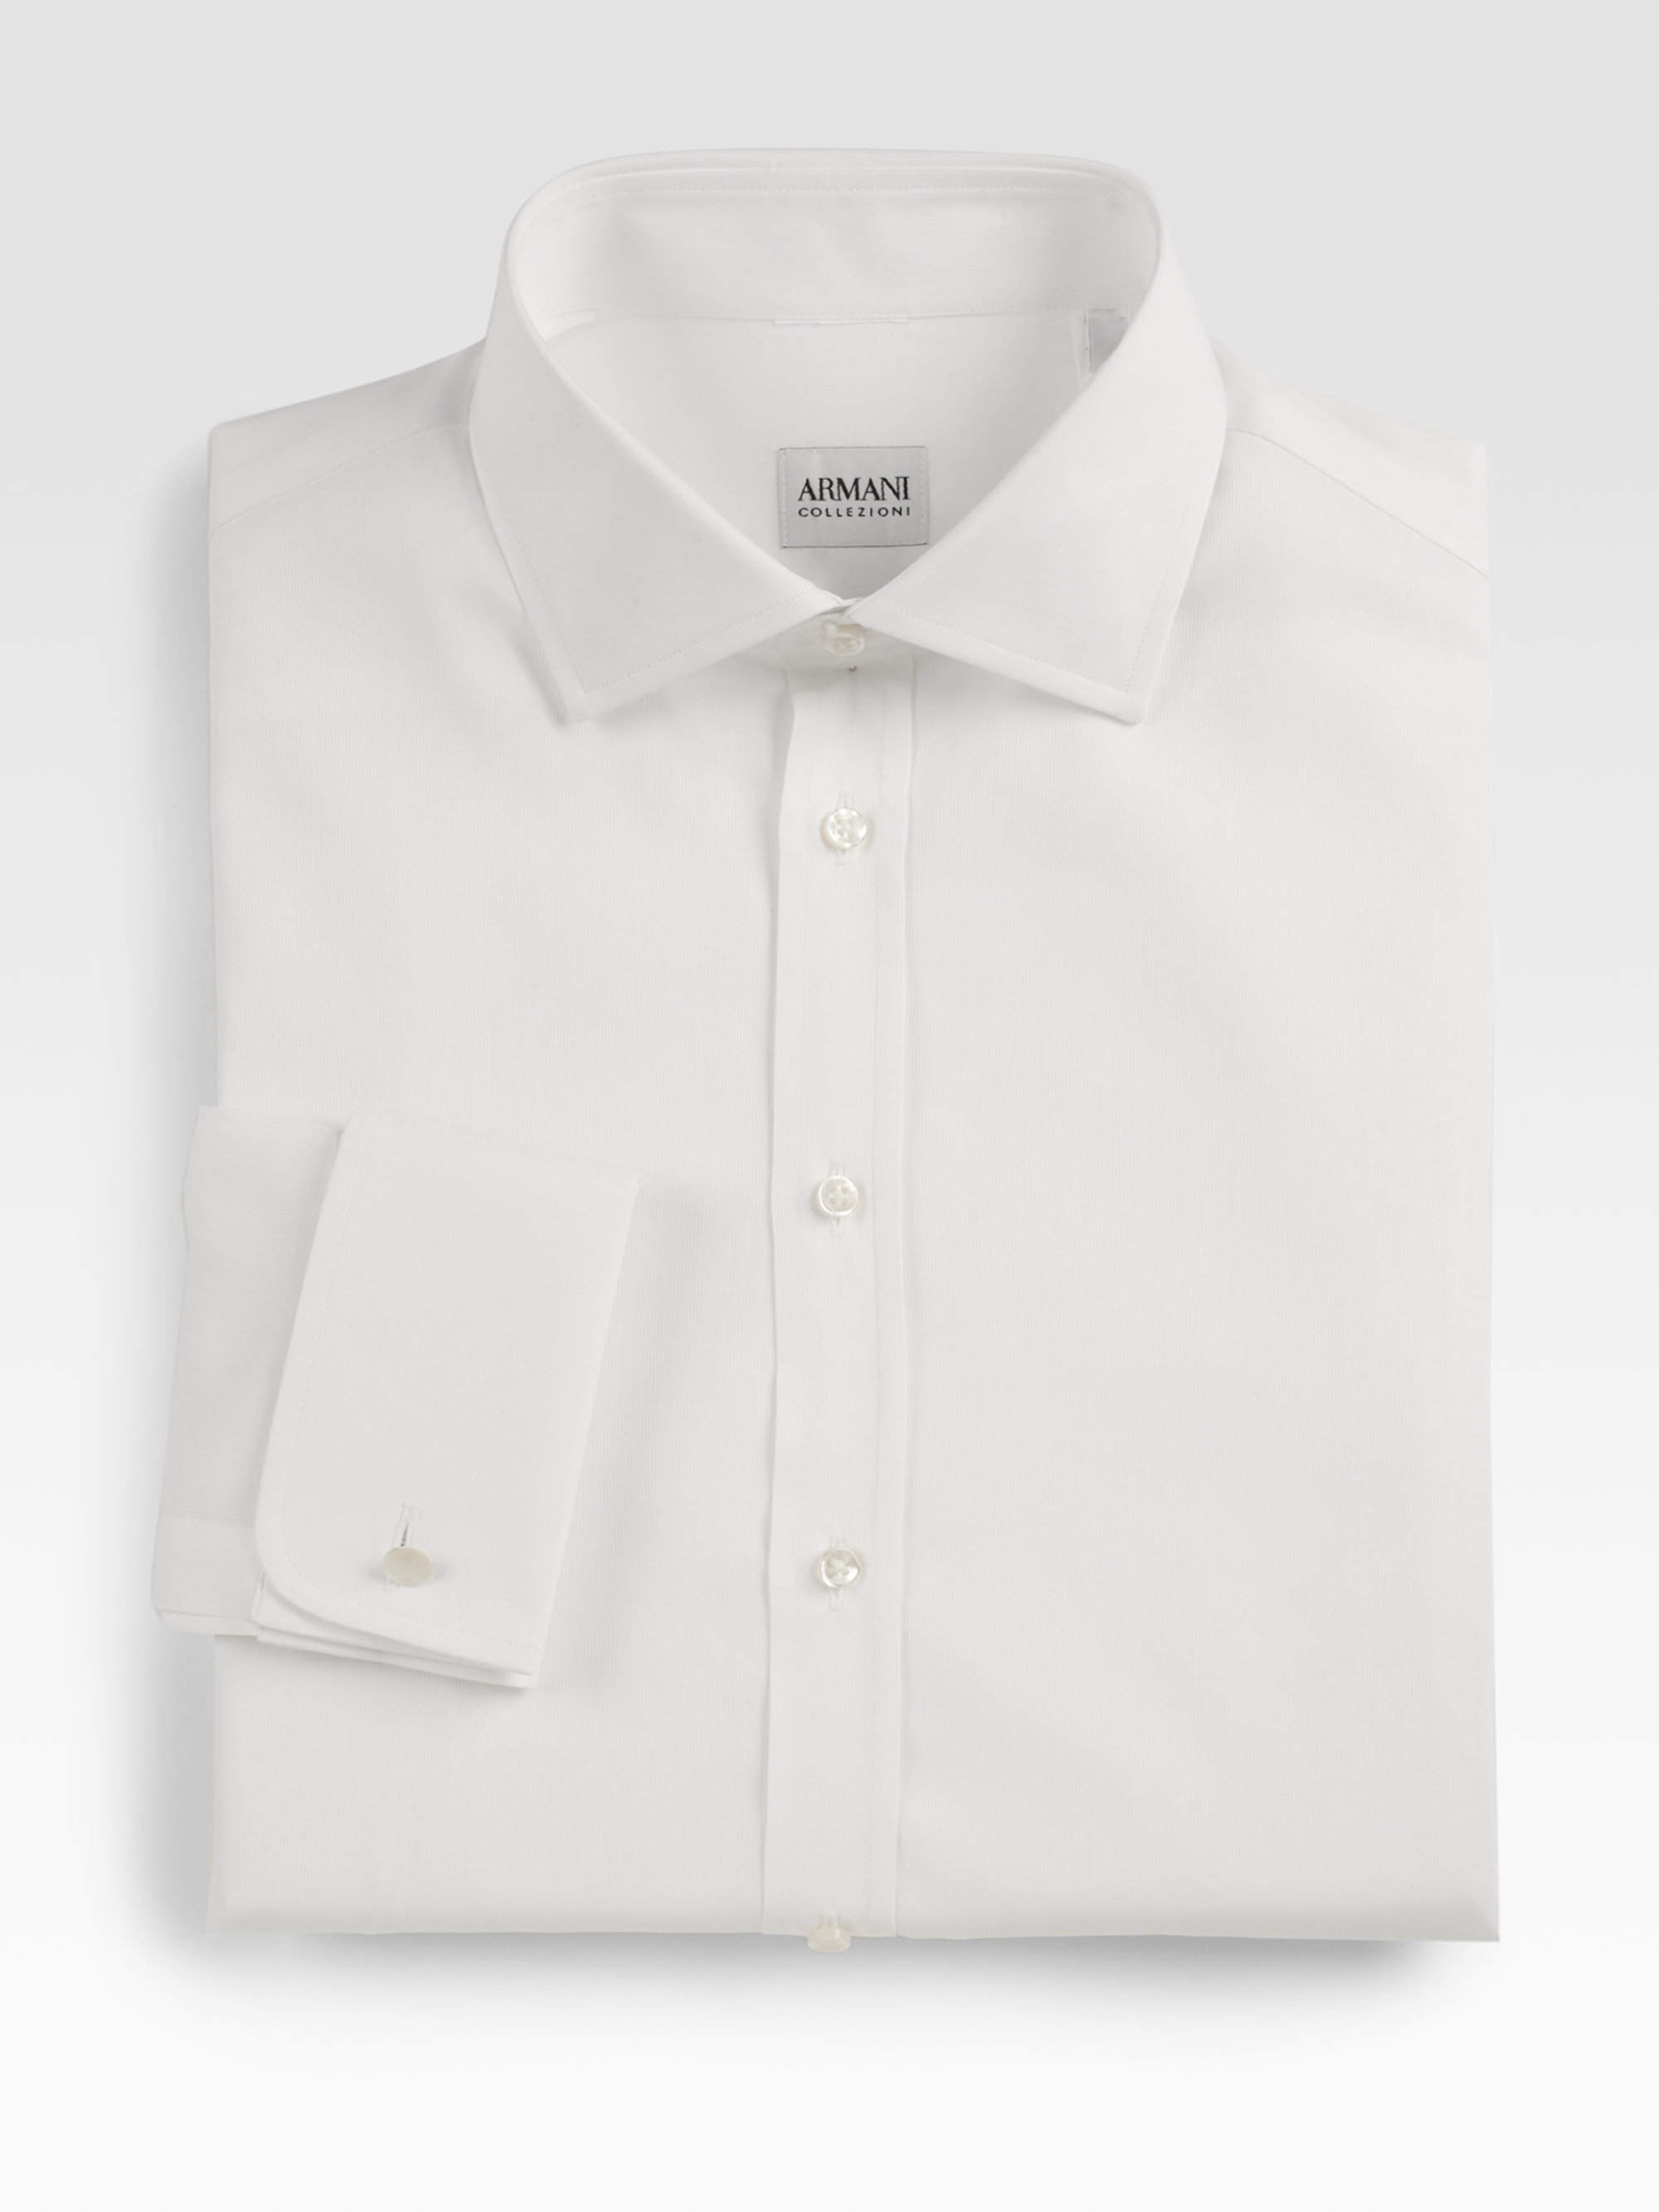 Armani modern fit french cuff dress shirt in white for men for Modern fit dress shirt